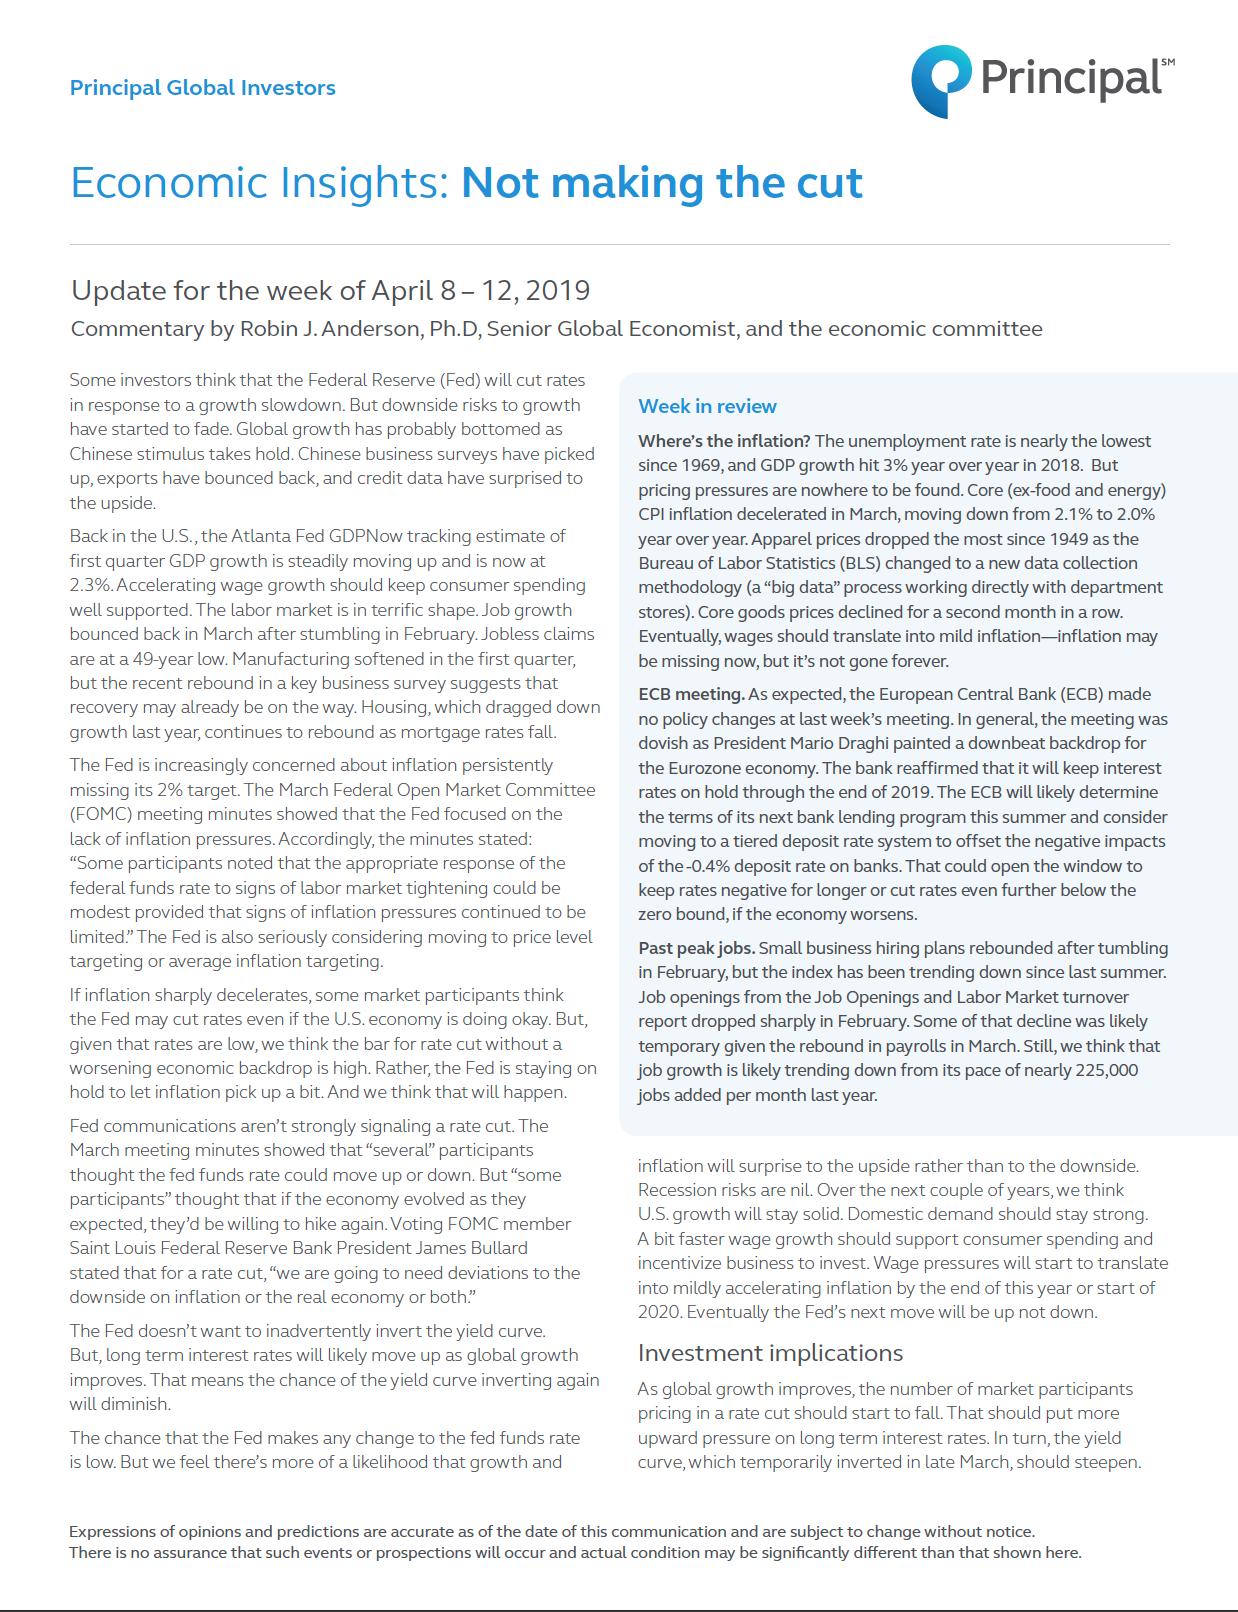 Thumb: Economic Insights - April 8 - 12, 2019